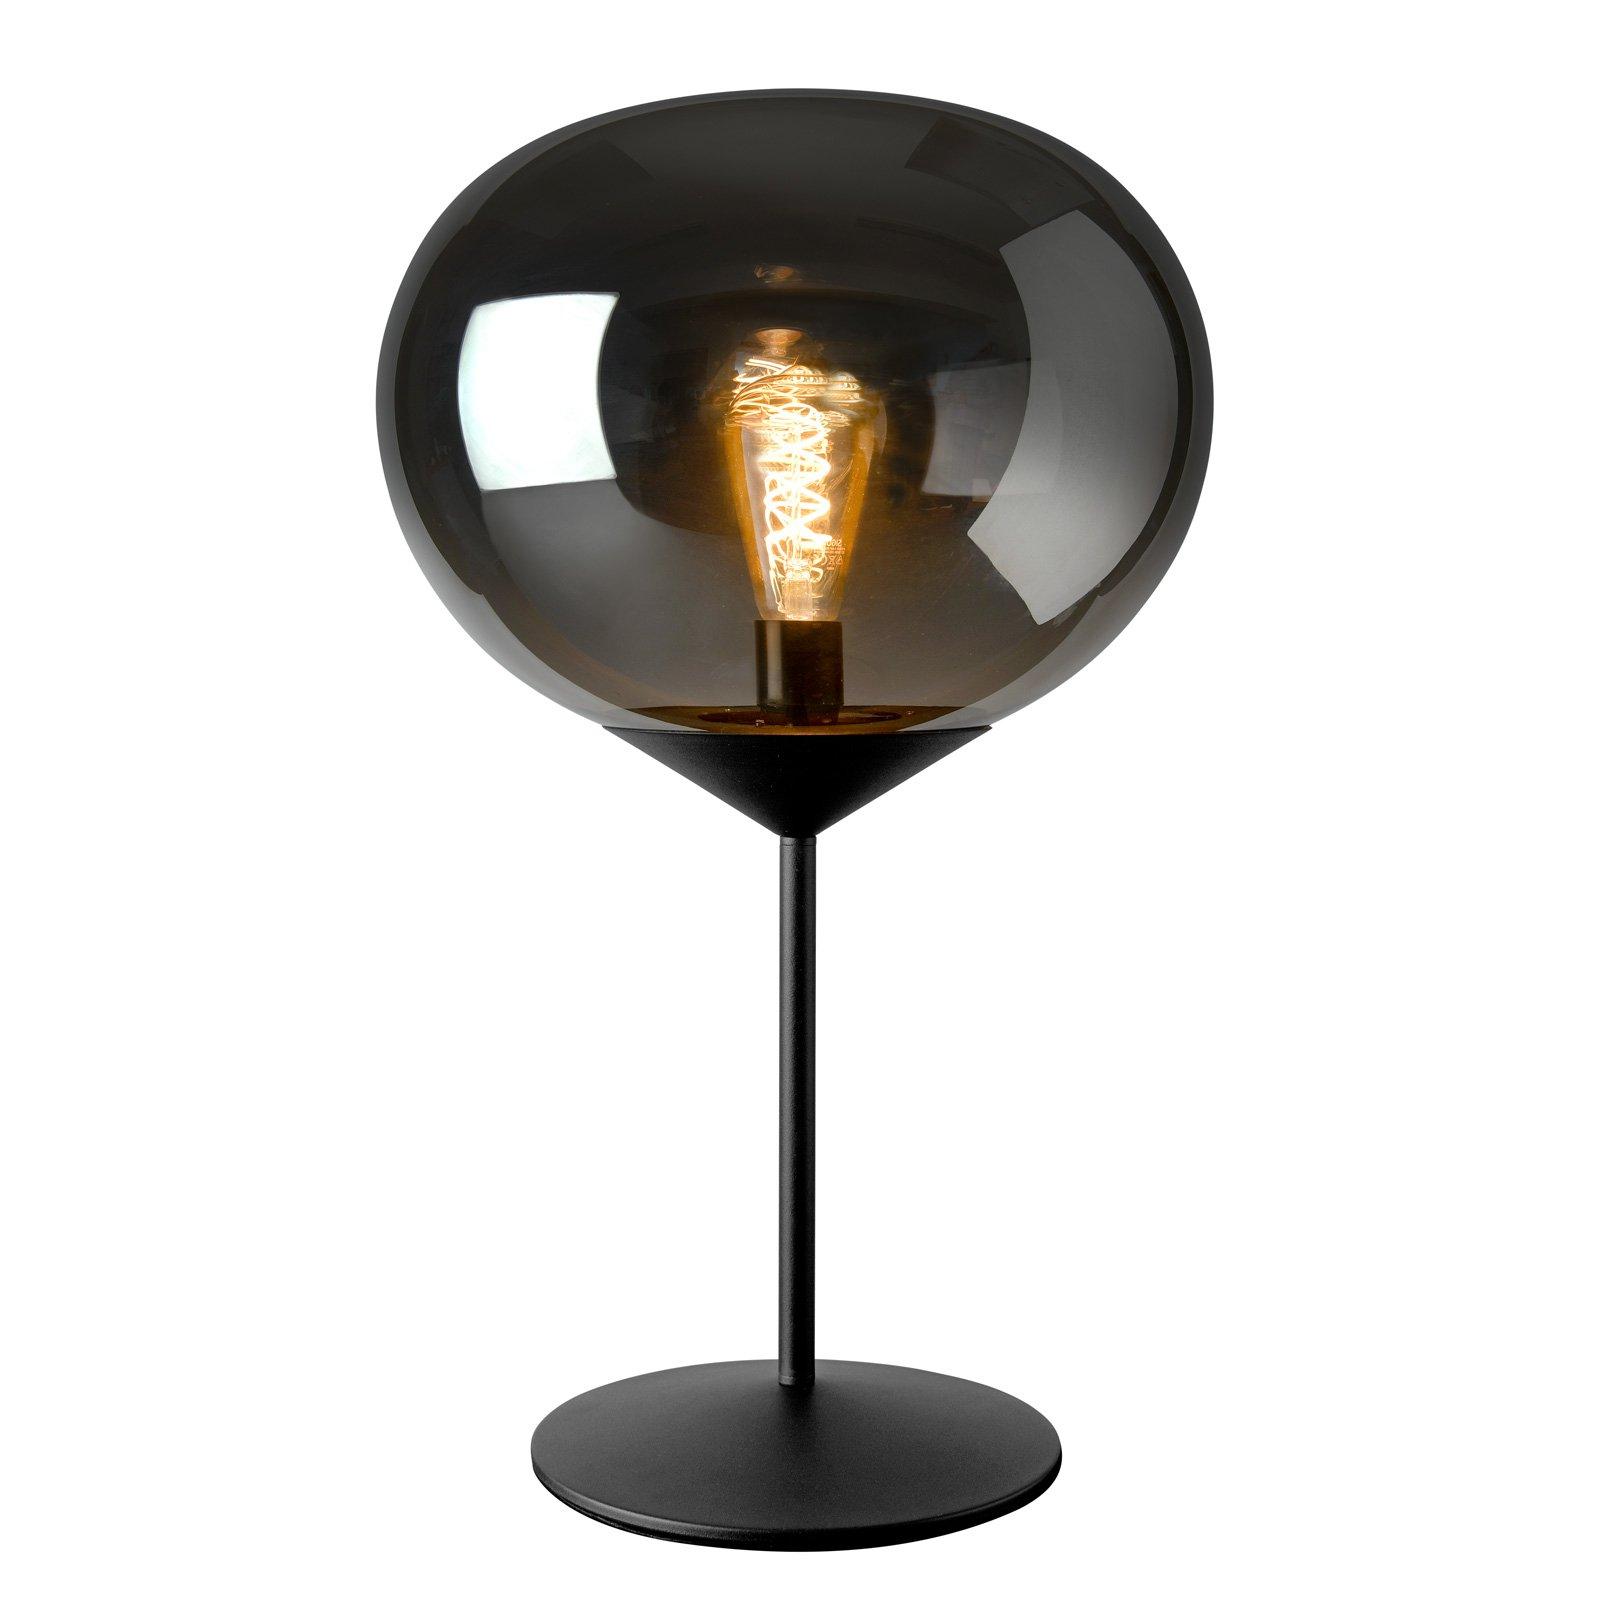 Bordlampe Drop med røykglass-skjerm